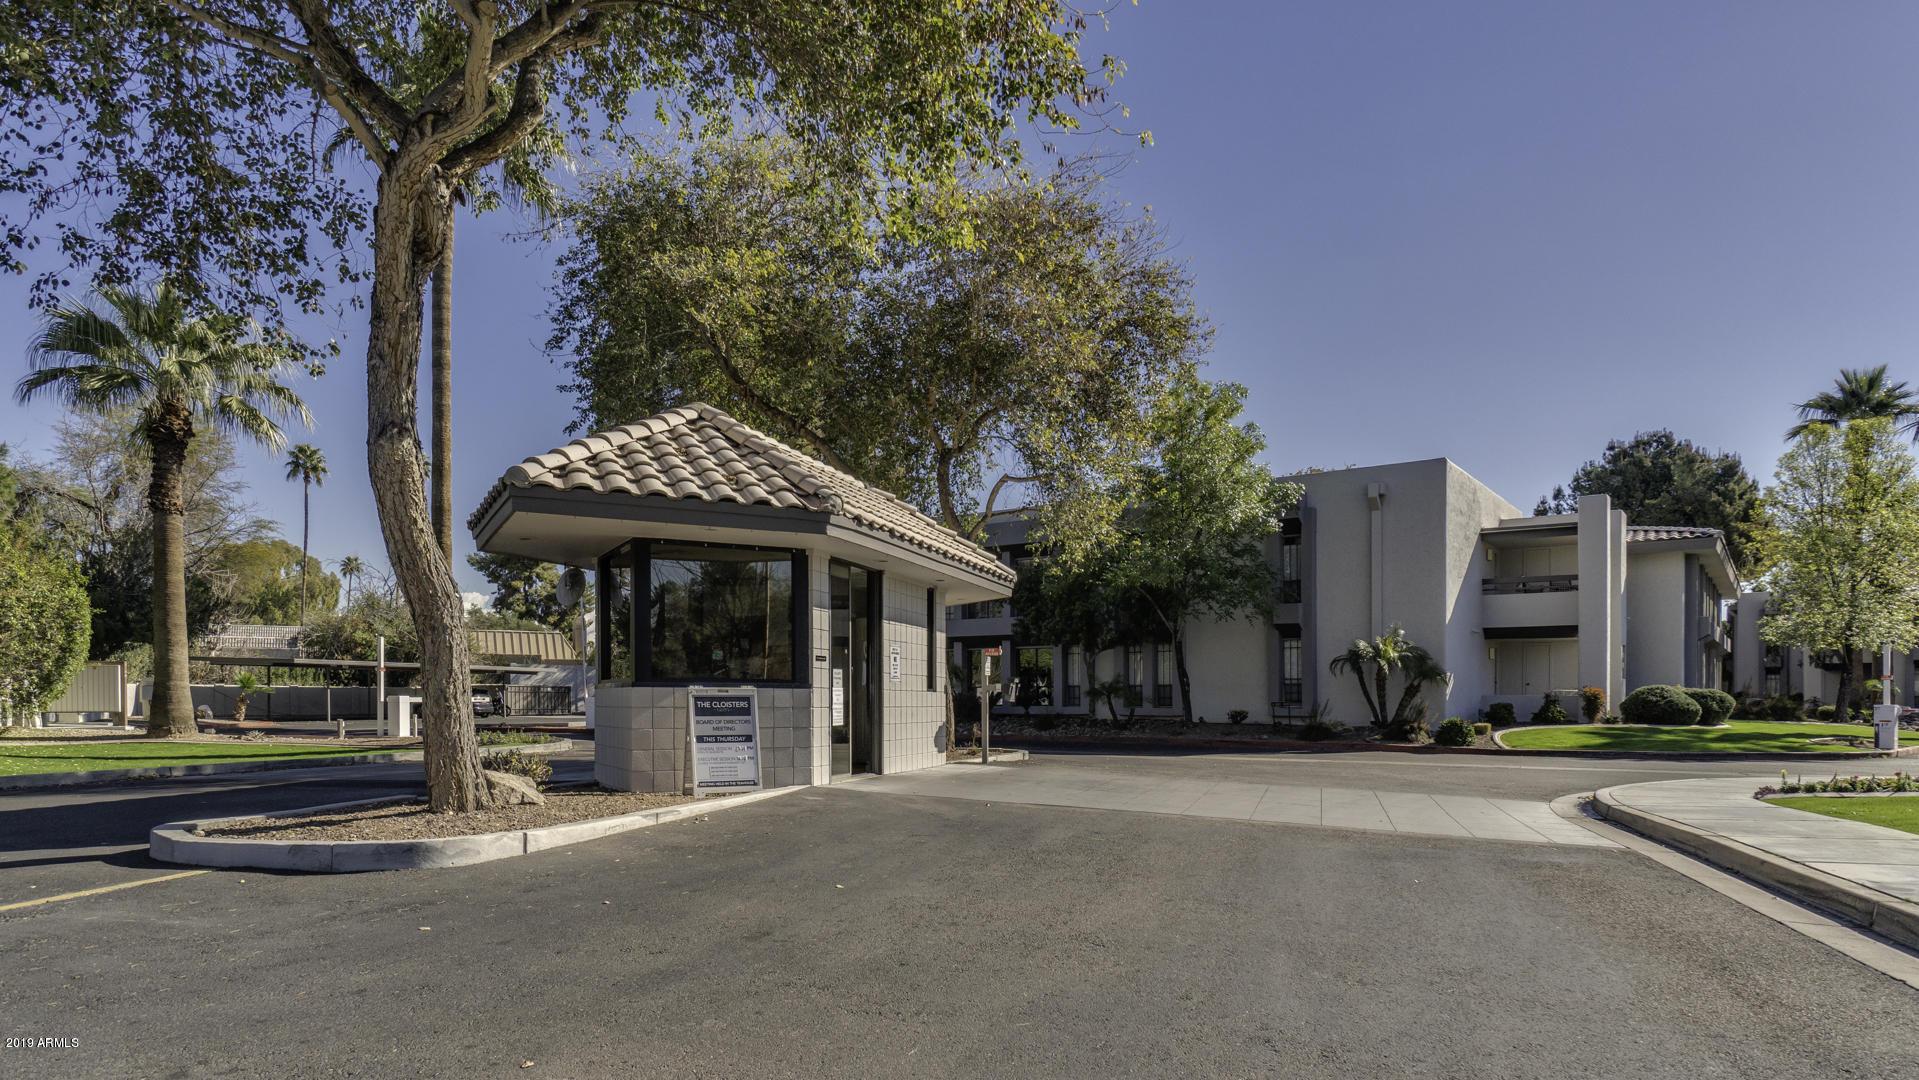 Photo for 5213 N 24th Street, Unit 103, Phoenix, AZ 85016 (MLS # 5578871)